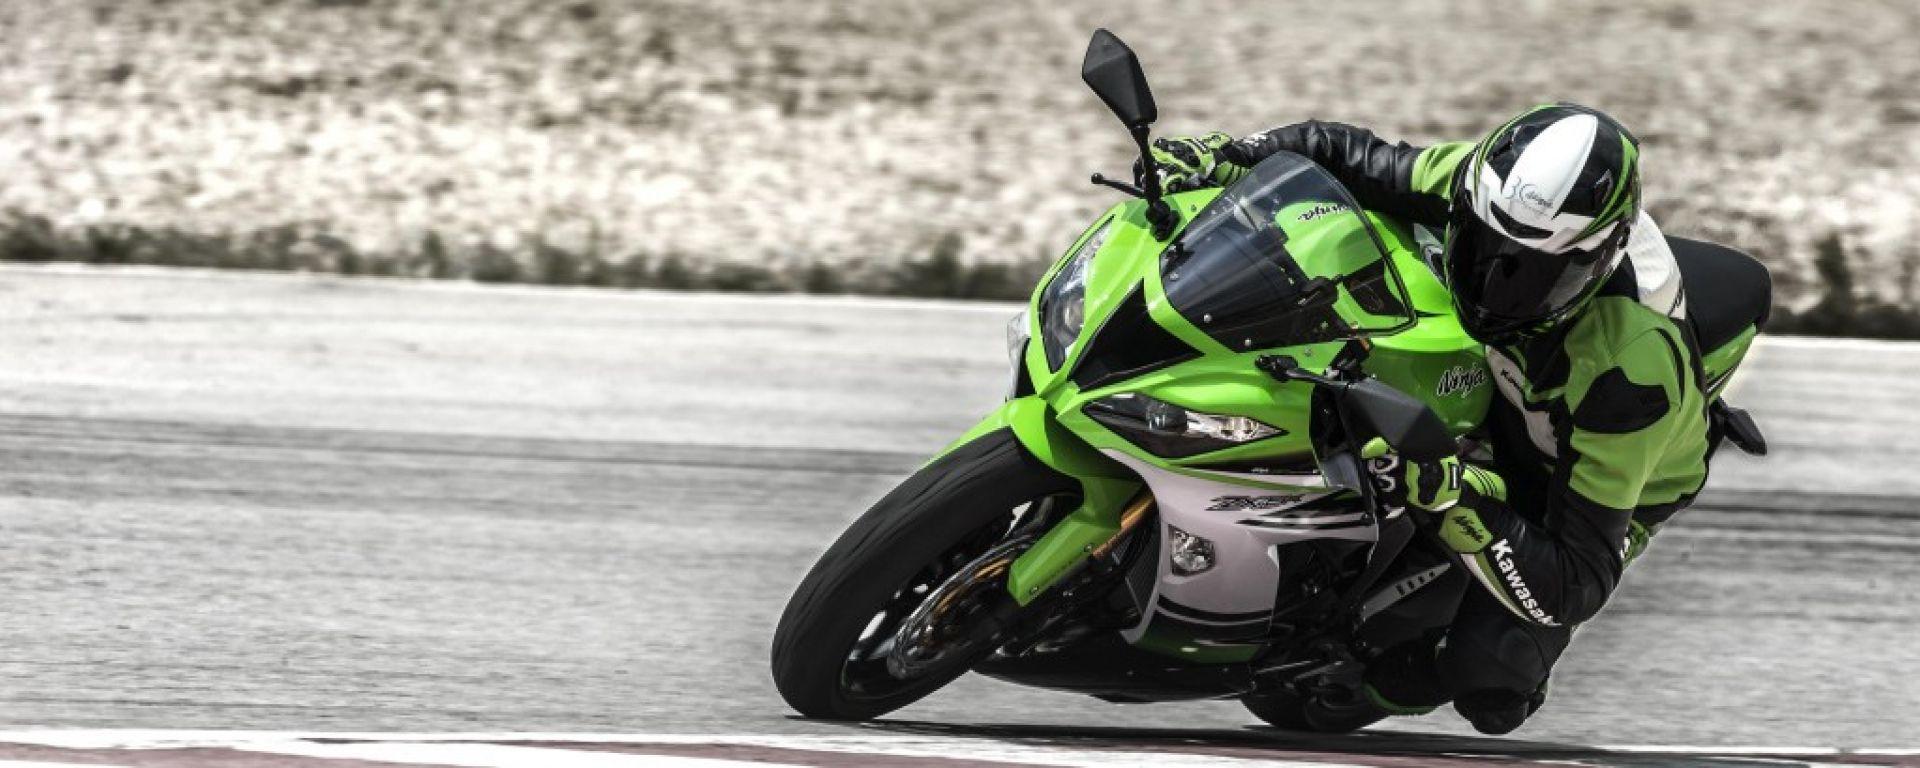 Tenetevi forte: nel 2019 torna la Kawasaki Ninja 636!